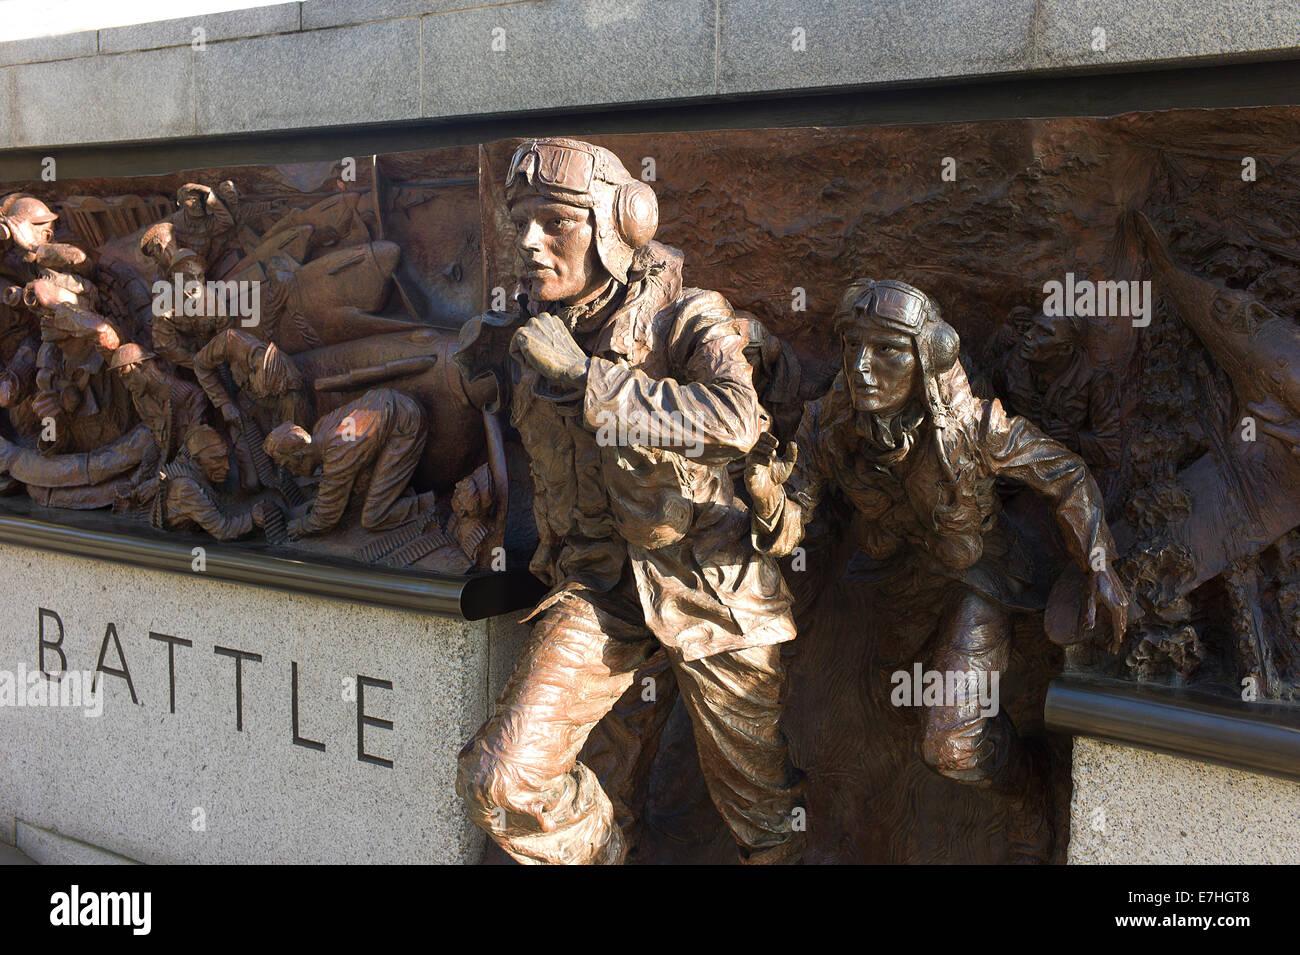 Battle of Britain monument on London's Embankment. - Stock Image